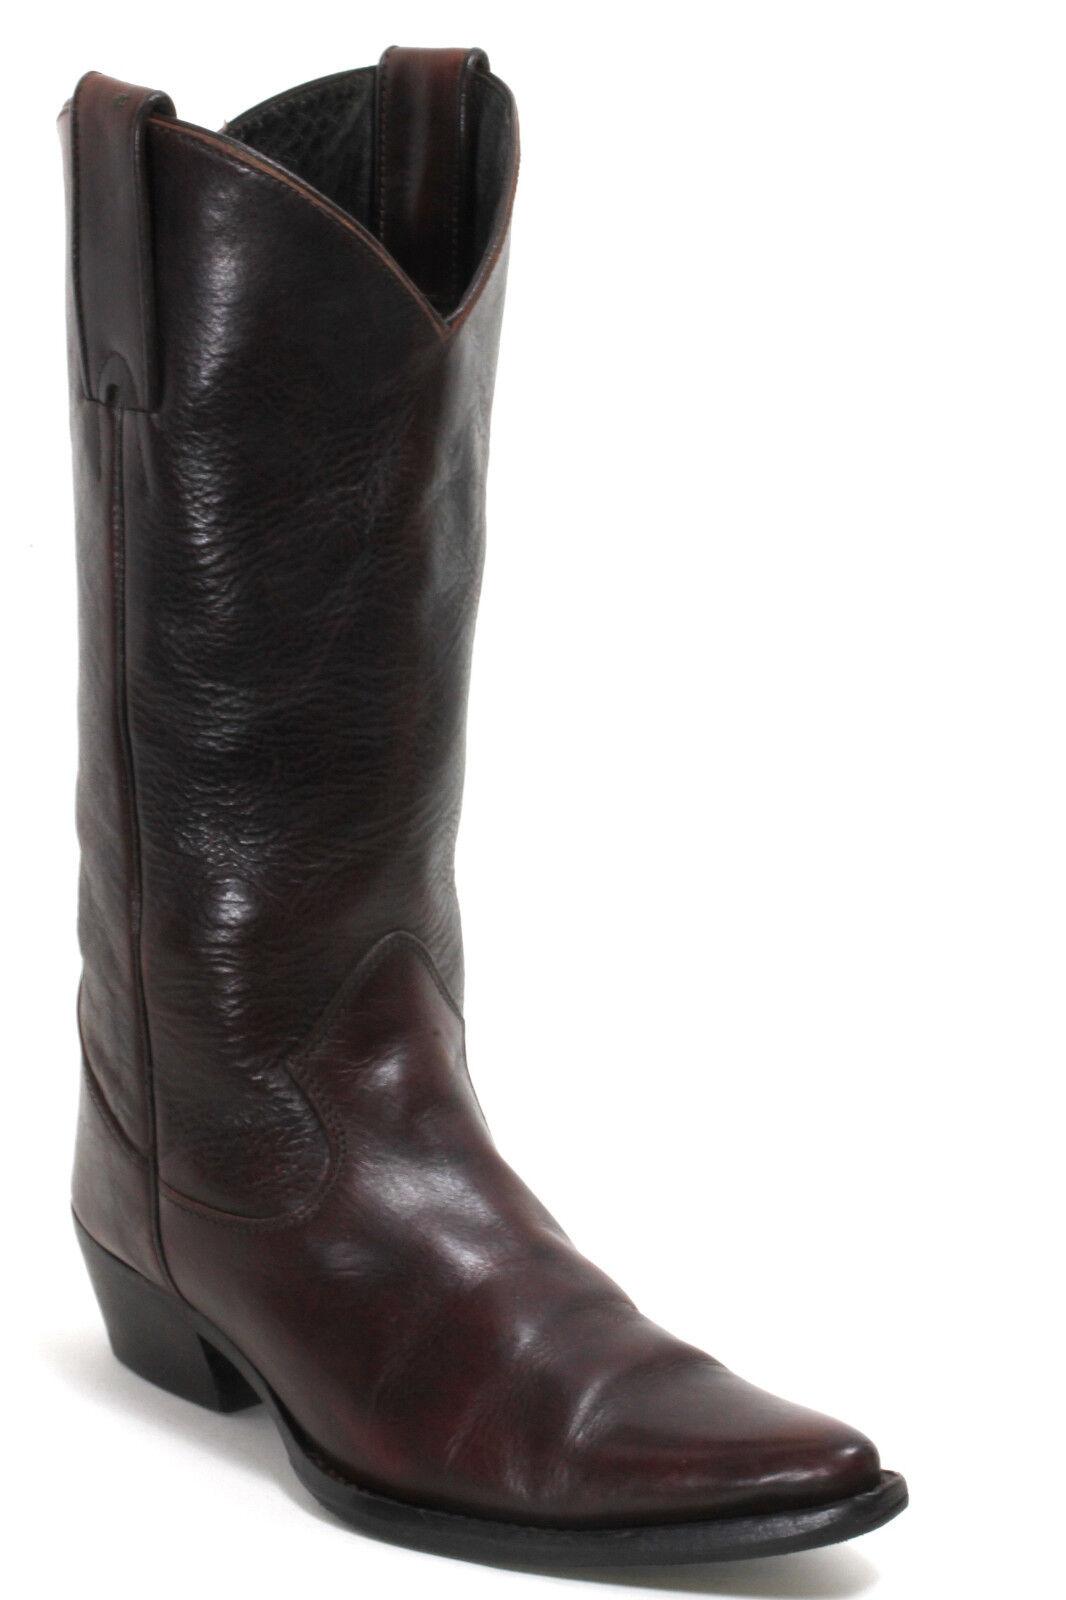 Westernstiefel Cowboystiefel Line Dance Texas Stiefel Catalan Style Bellerose 37